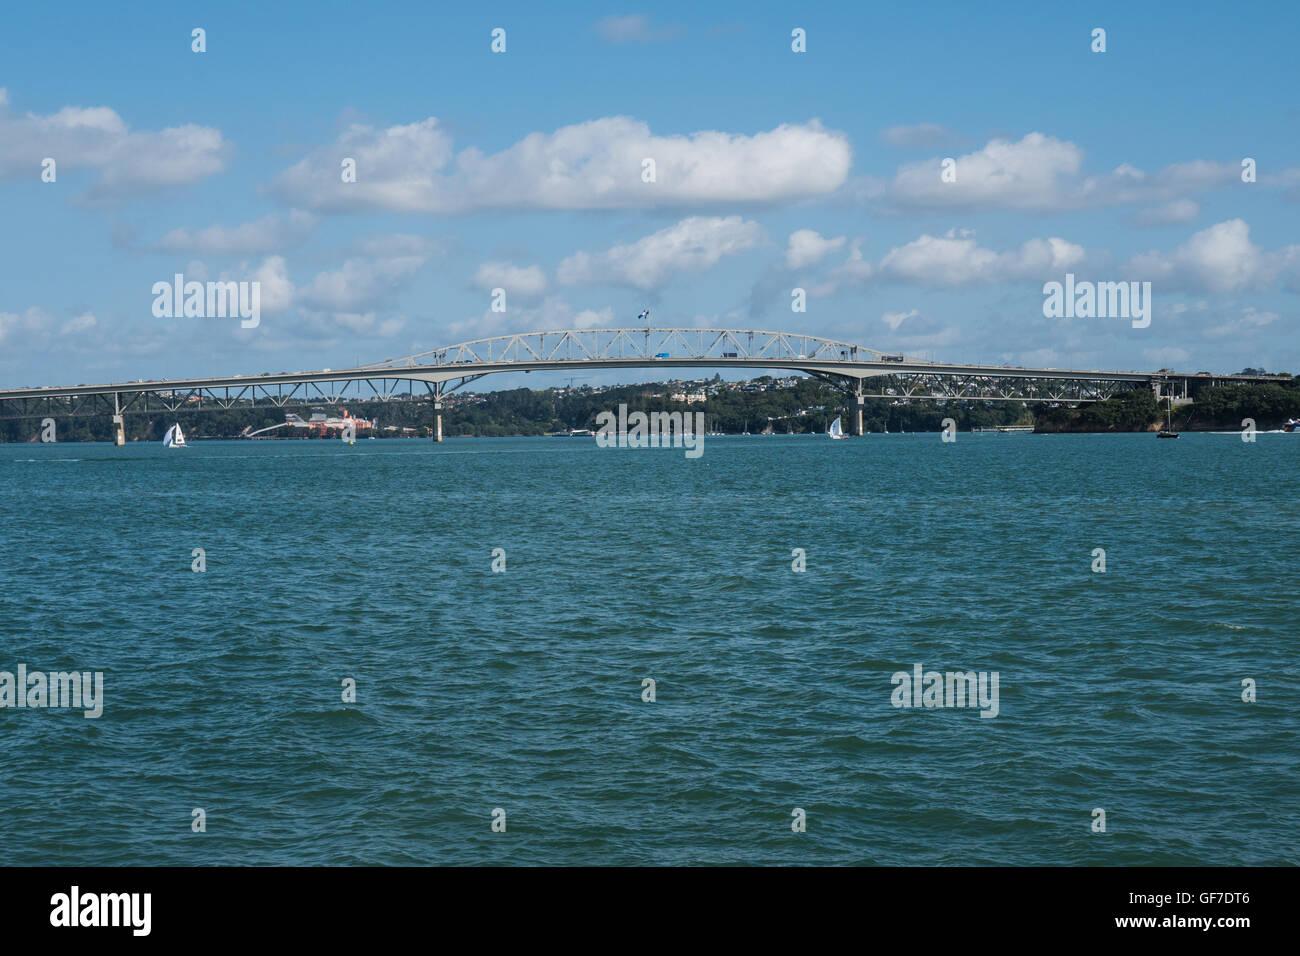 Auckland Harbour Bridge, North Island New Zealand. - Stock Image